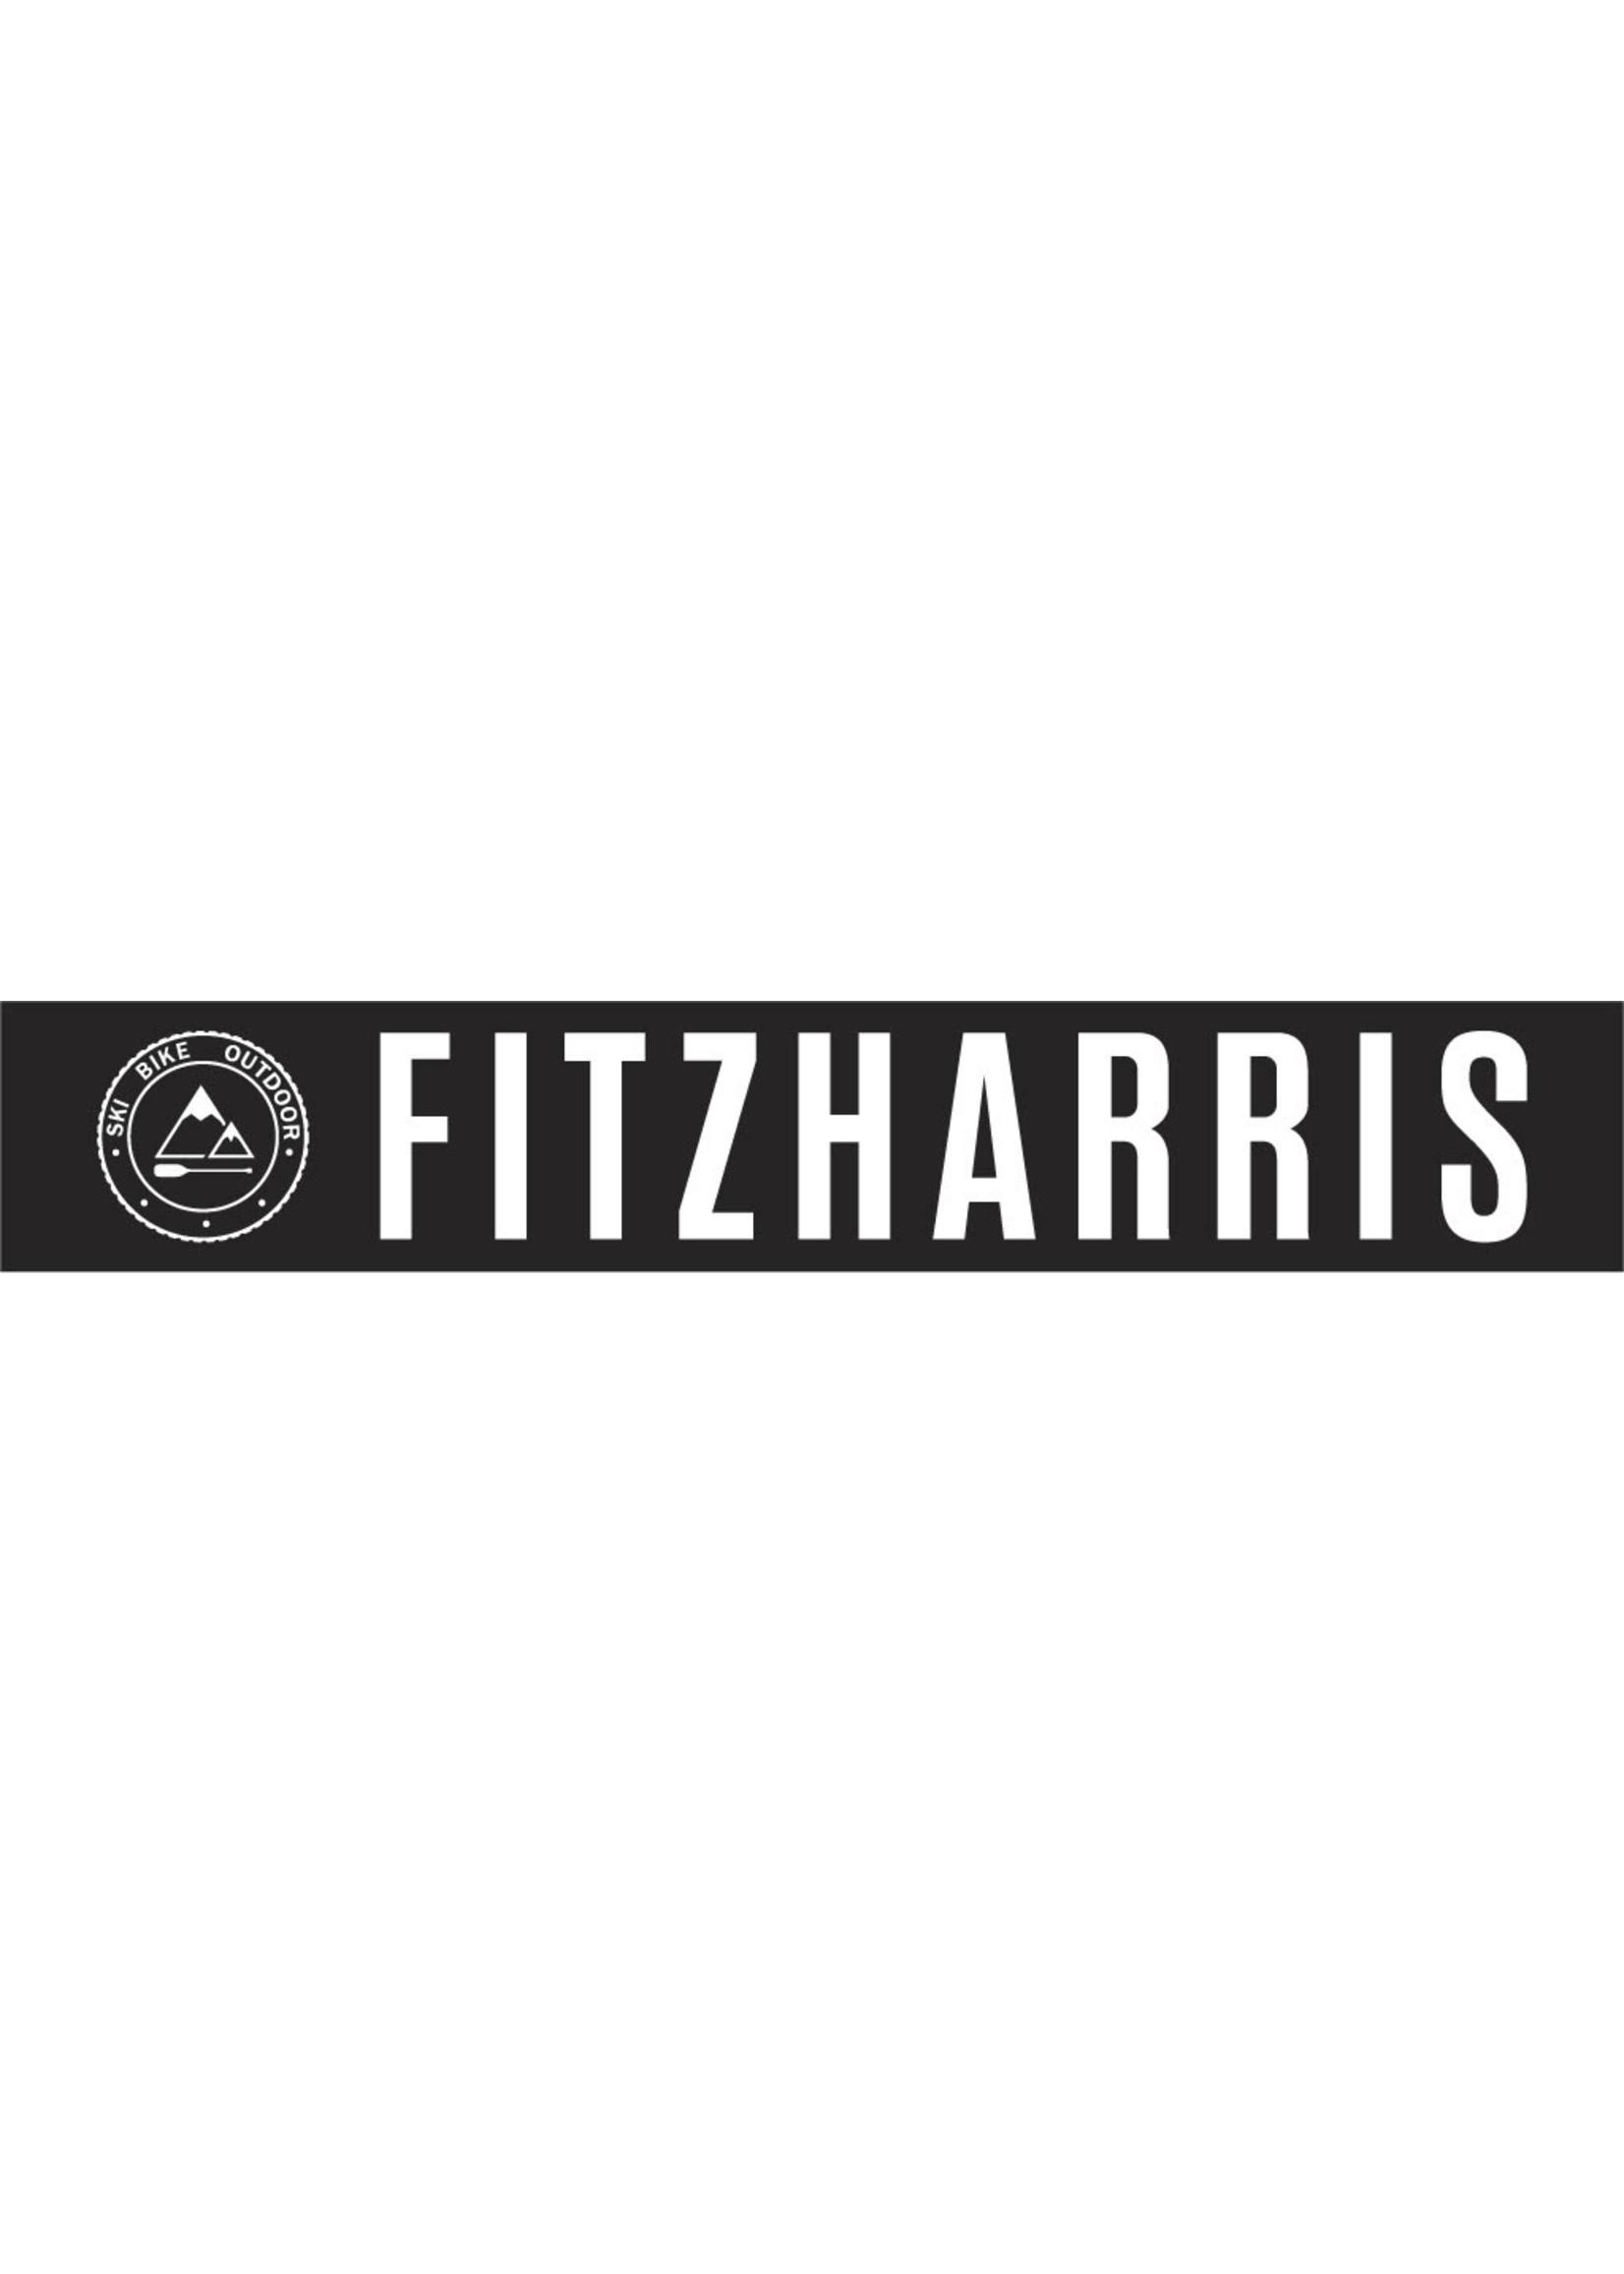 Fitzharris Fitzharris Gift Cards